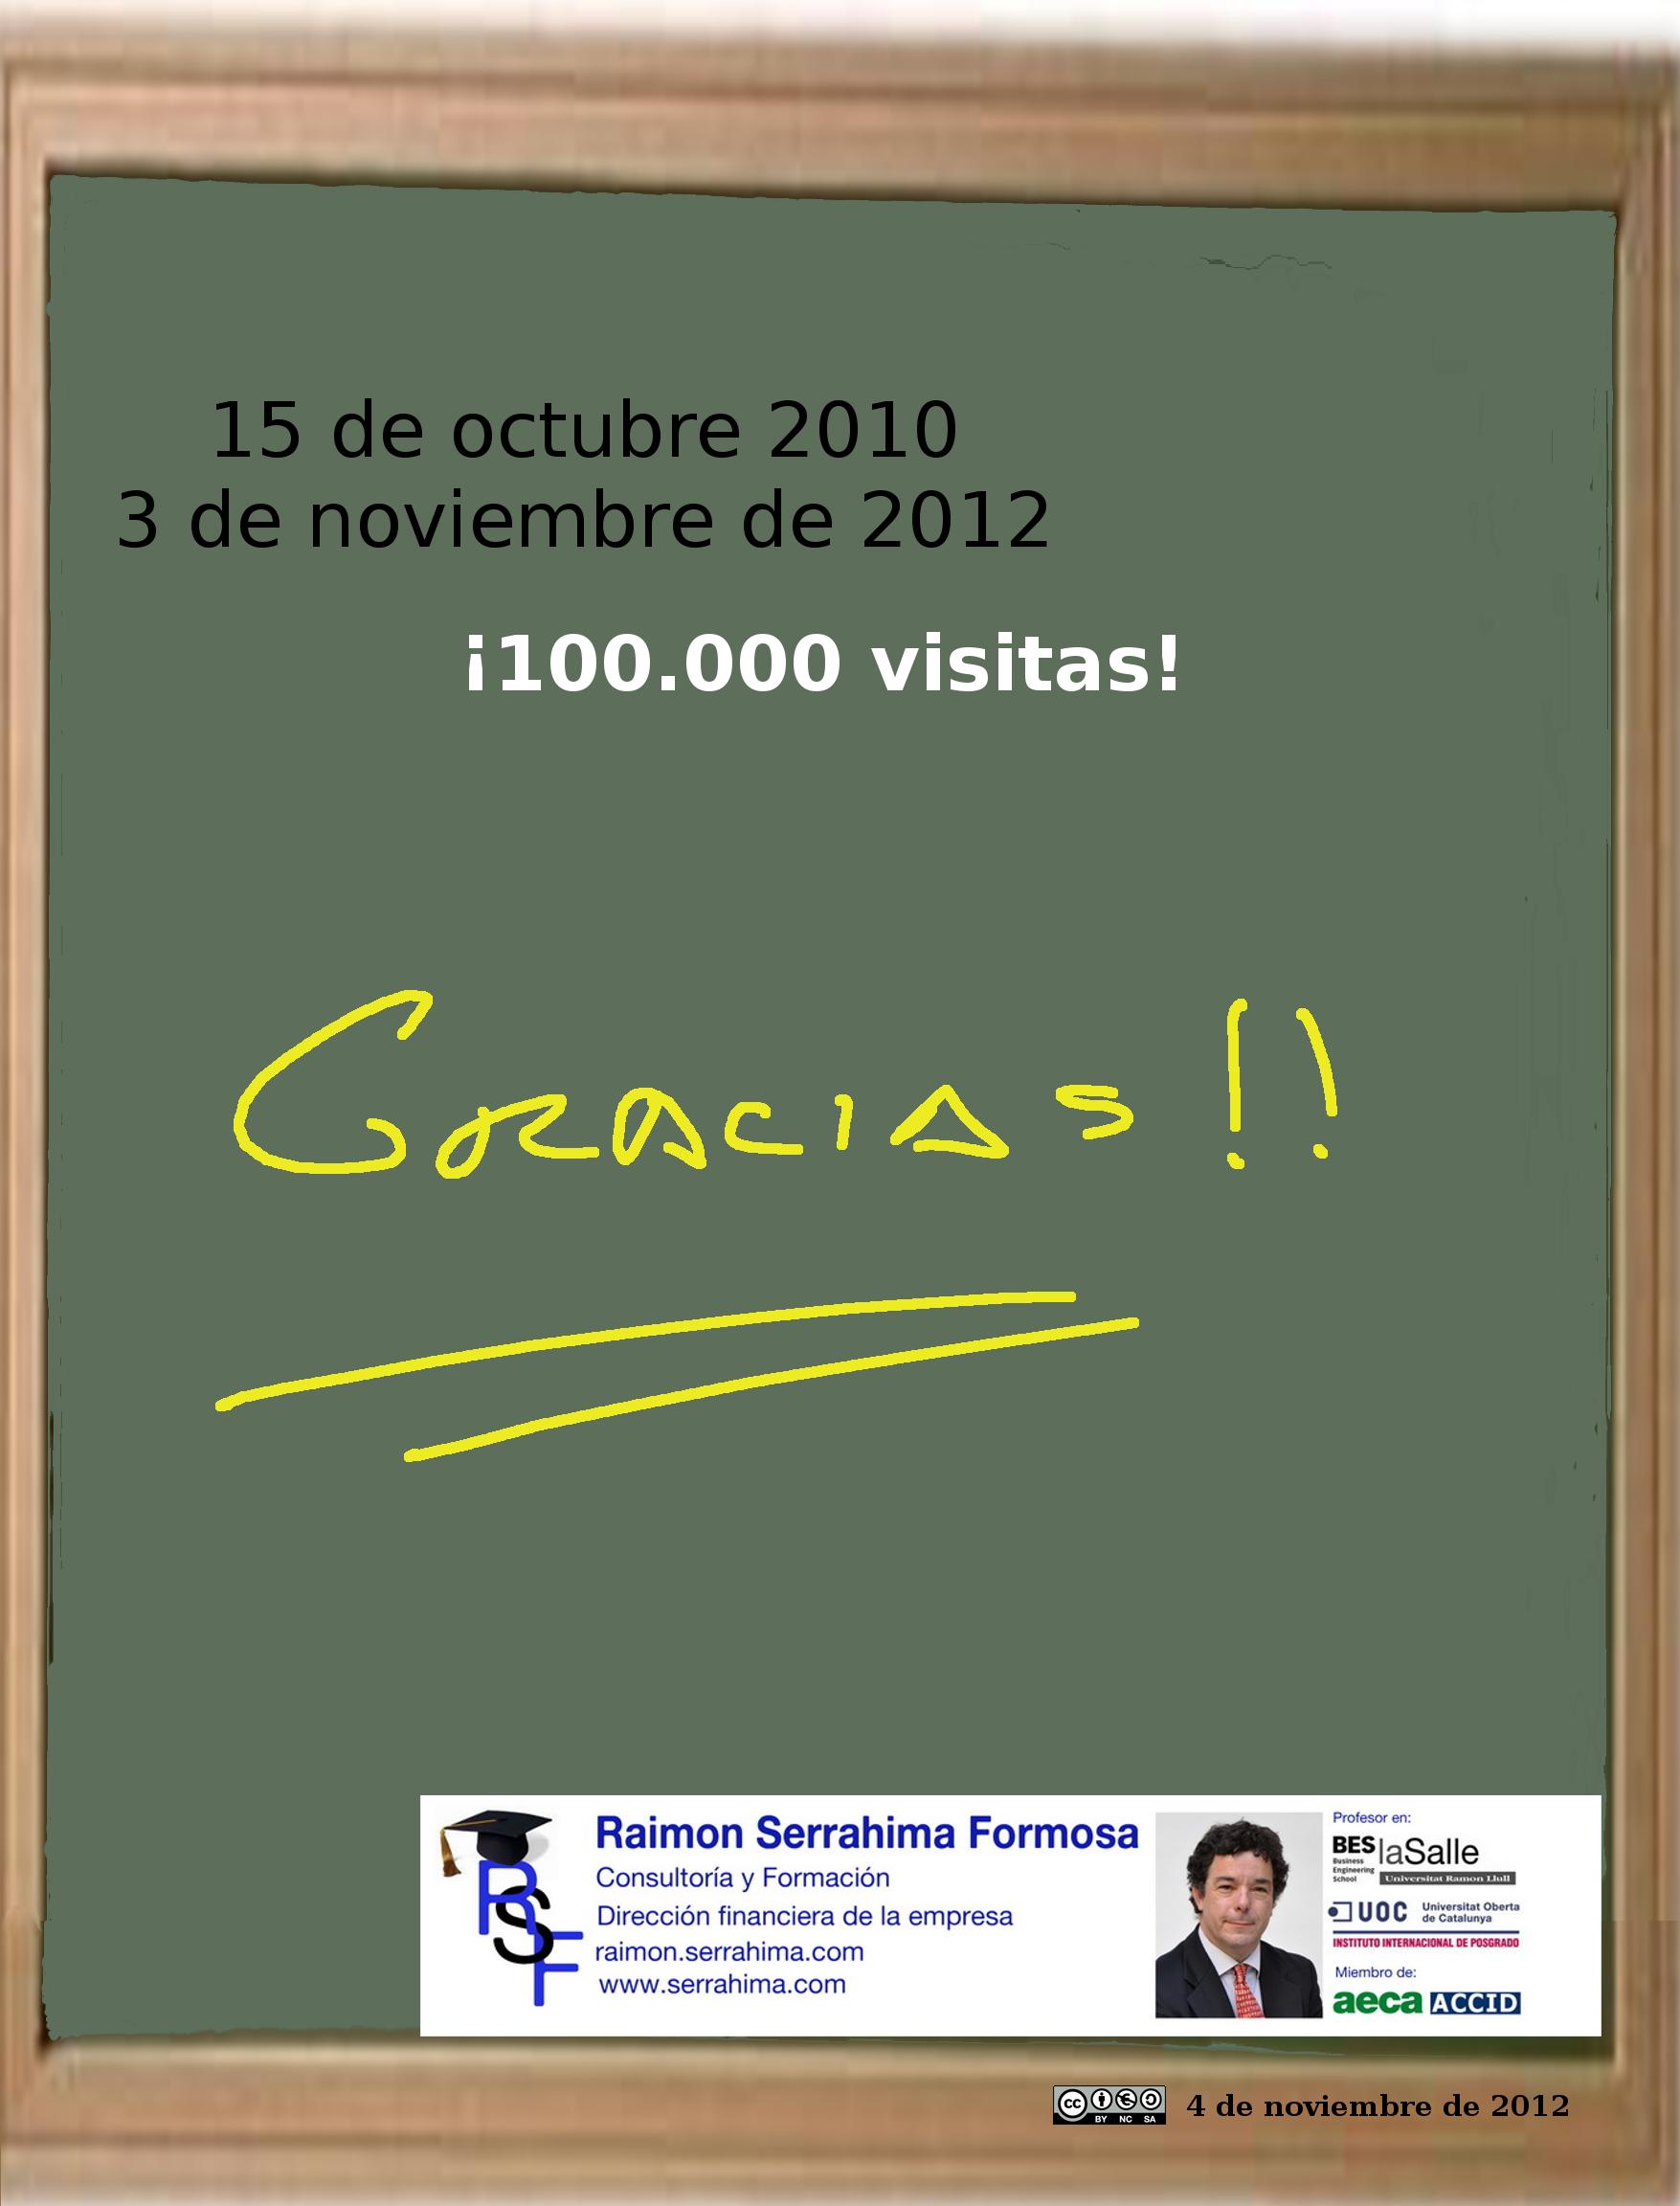 ¡100,000 visitas!